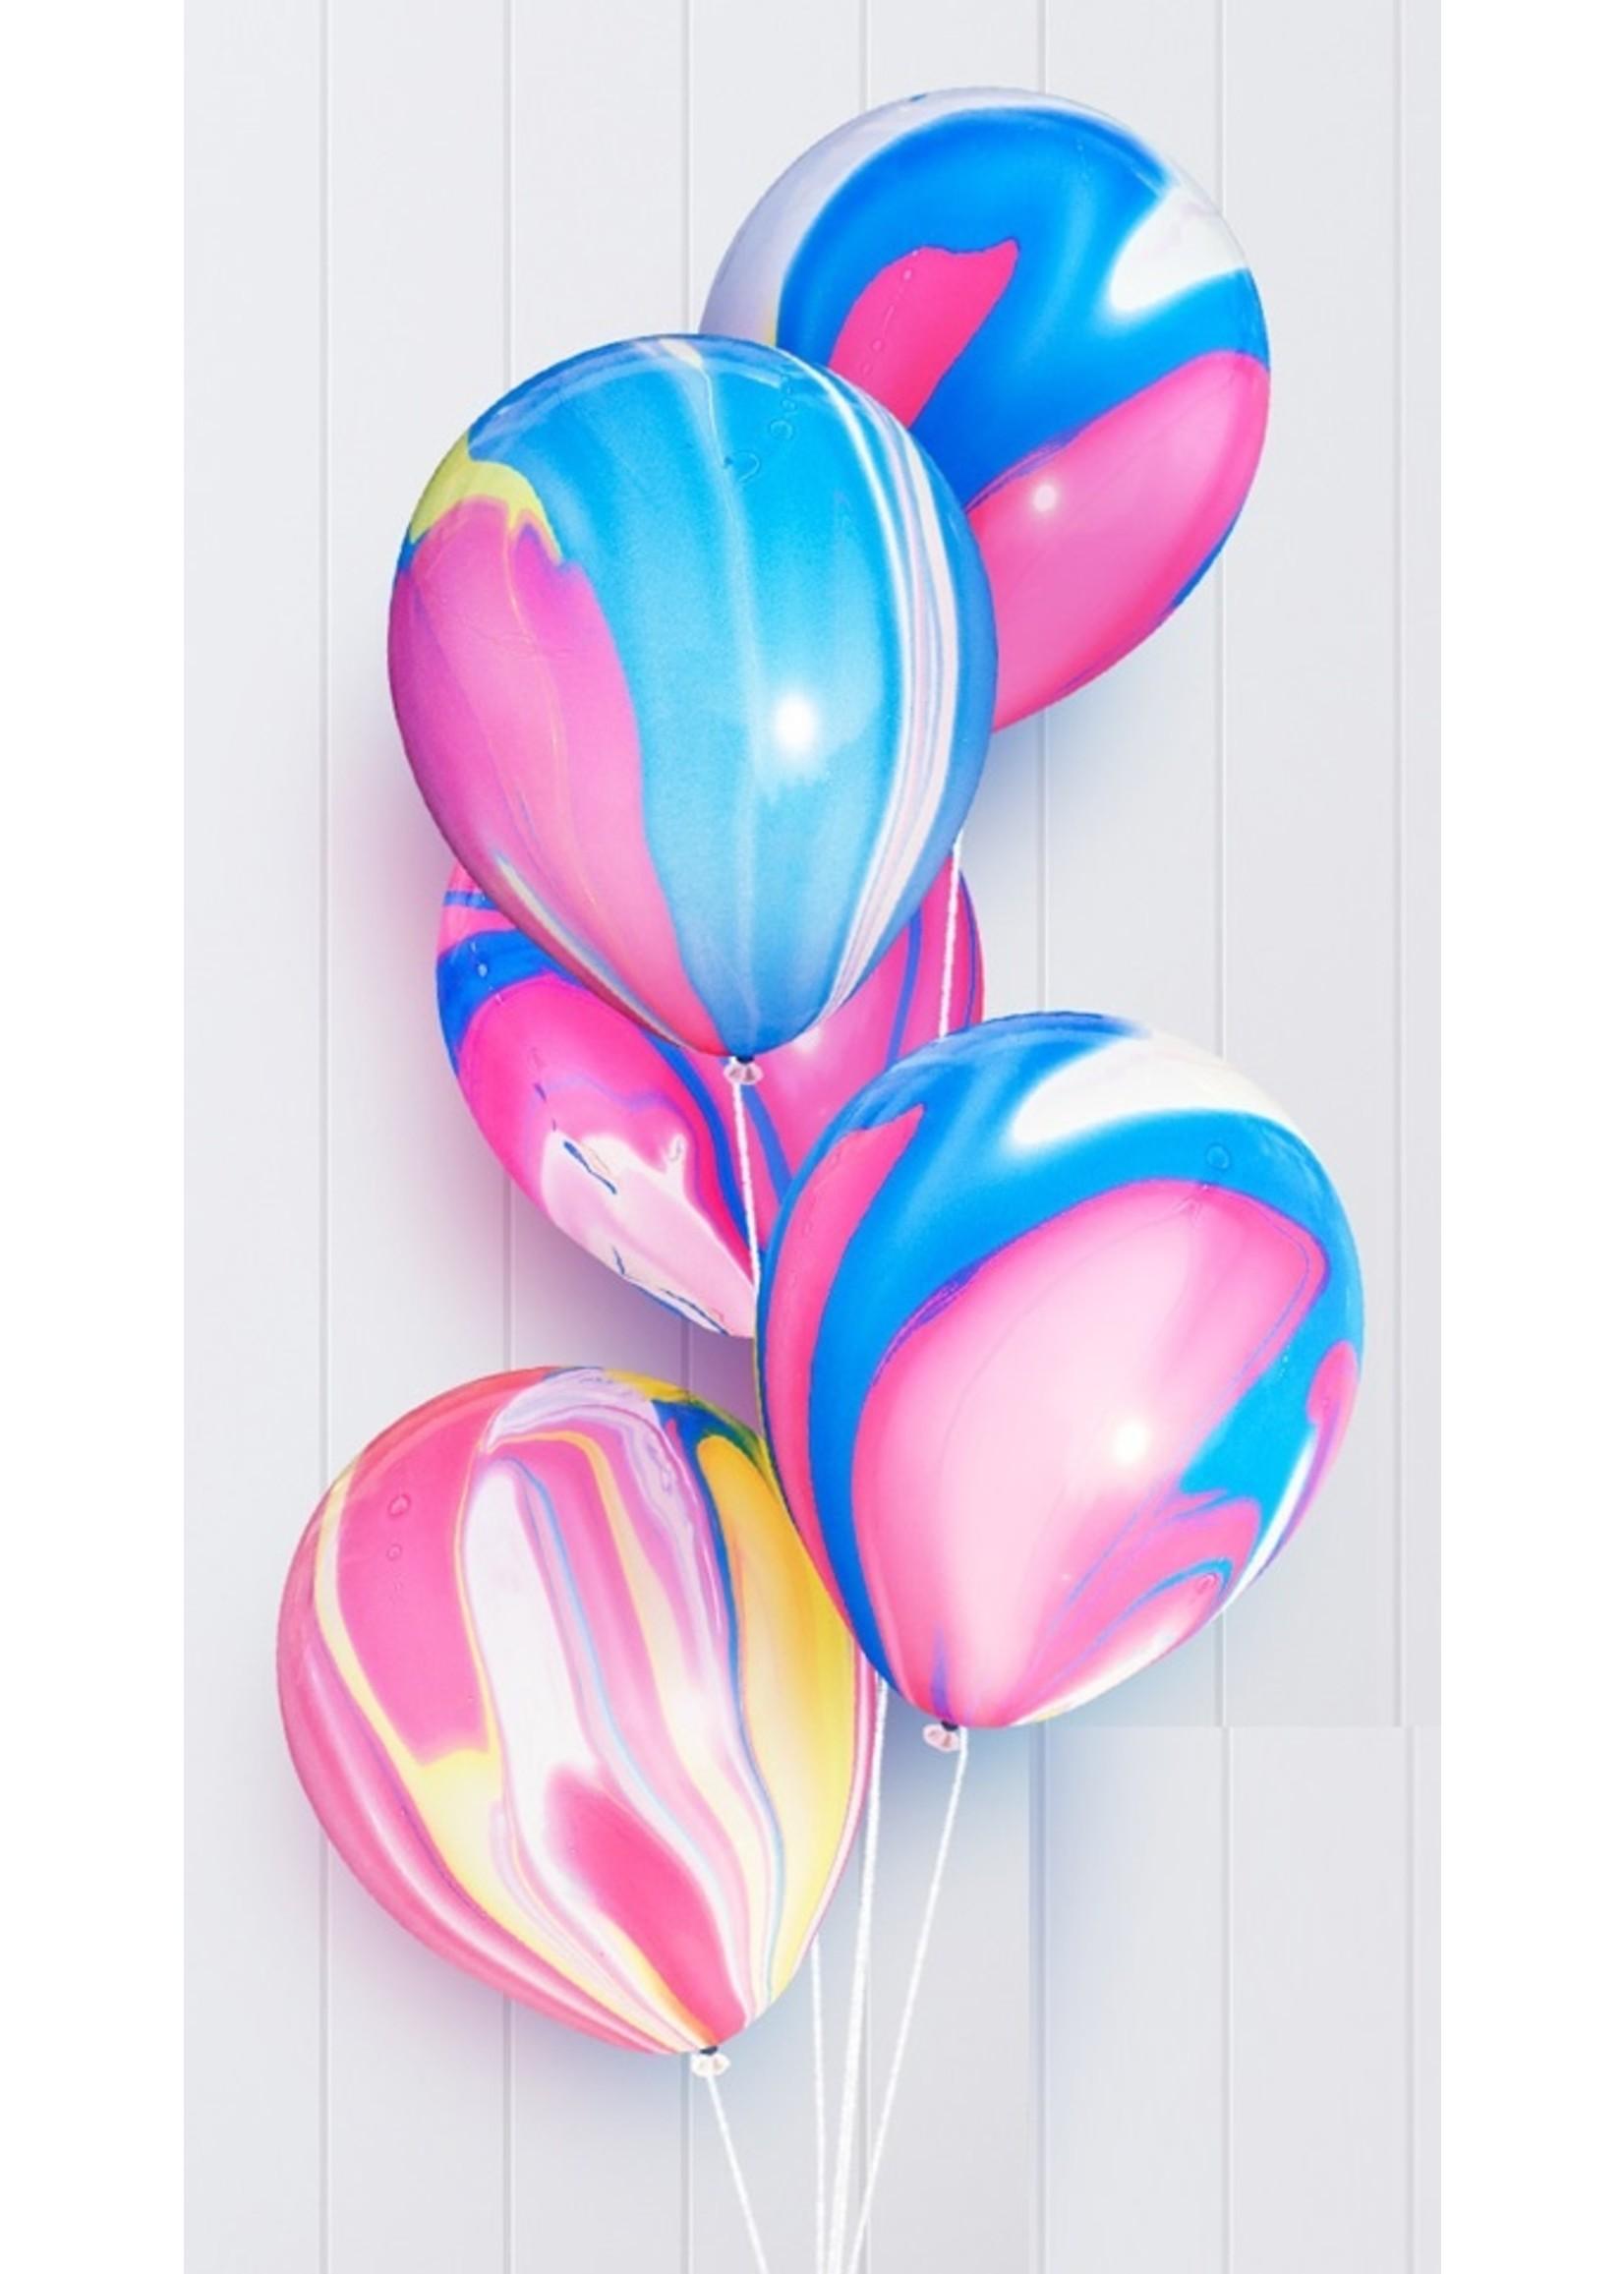 Annienas tie-dye ballon